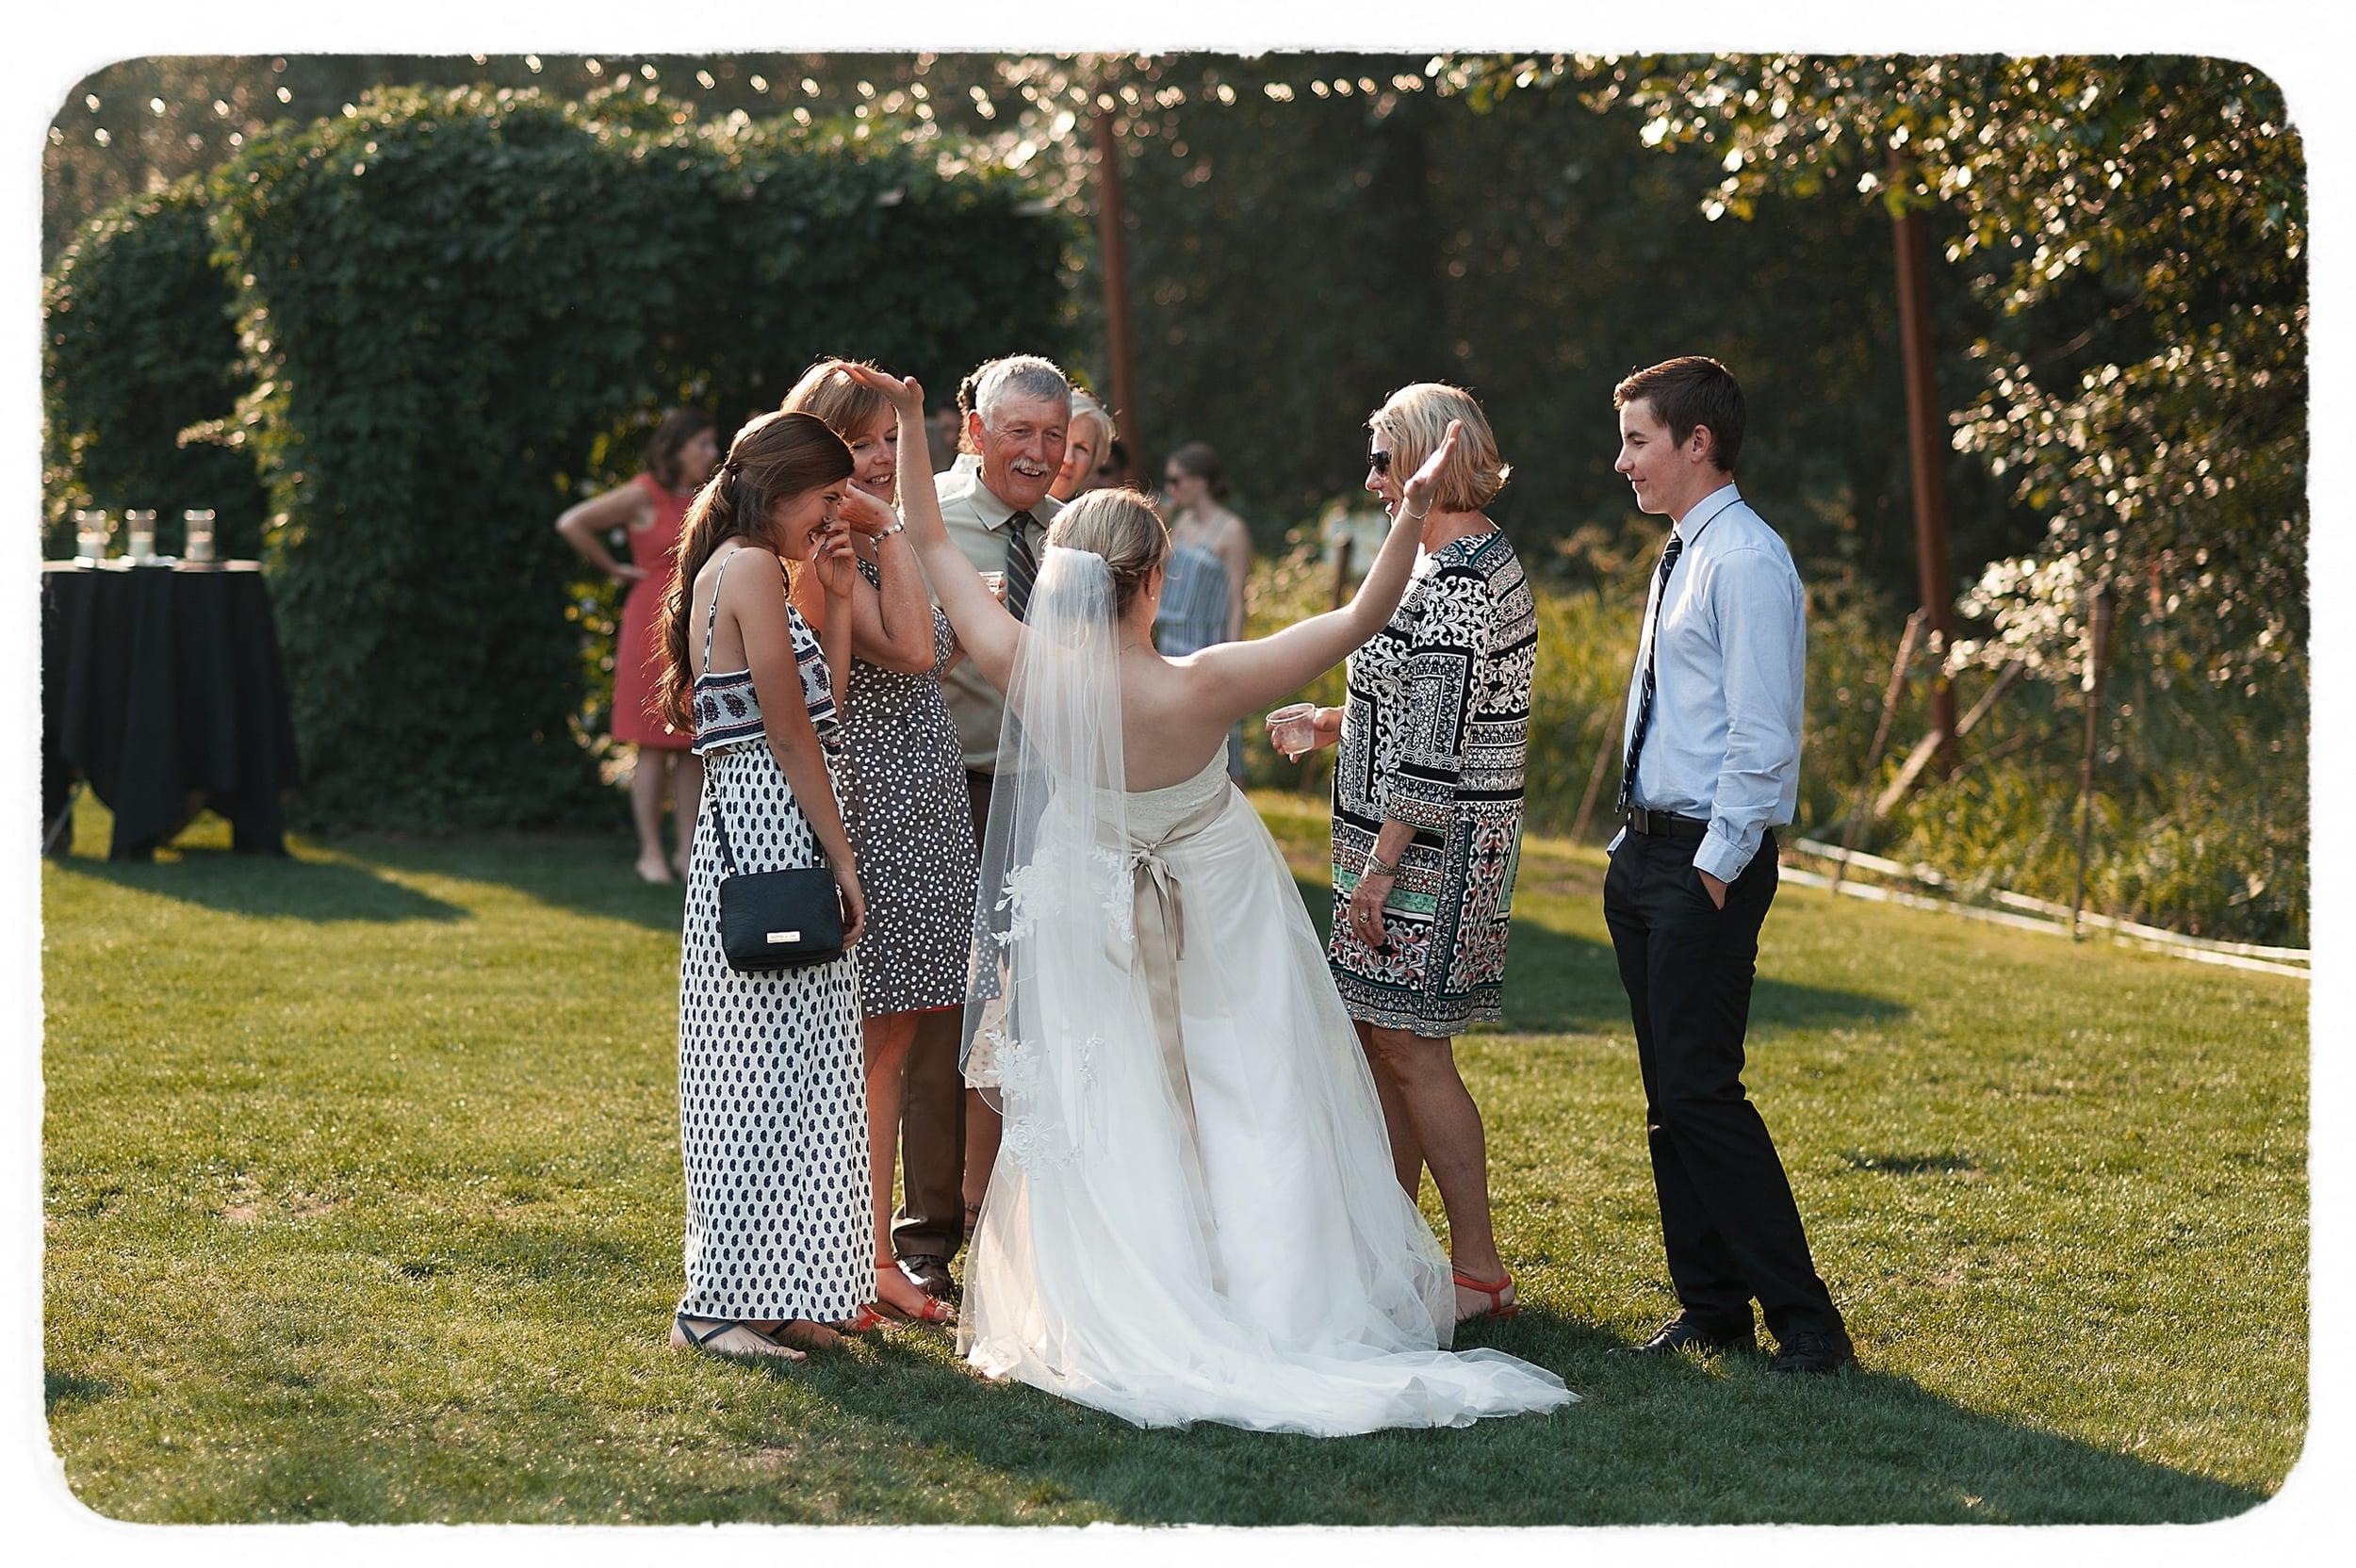 476 Kate&Marc-Wedding-OriginalCollection-476Film.jpg